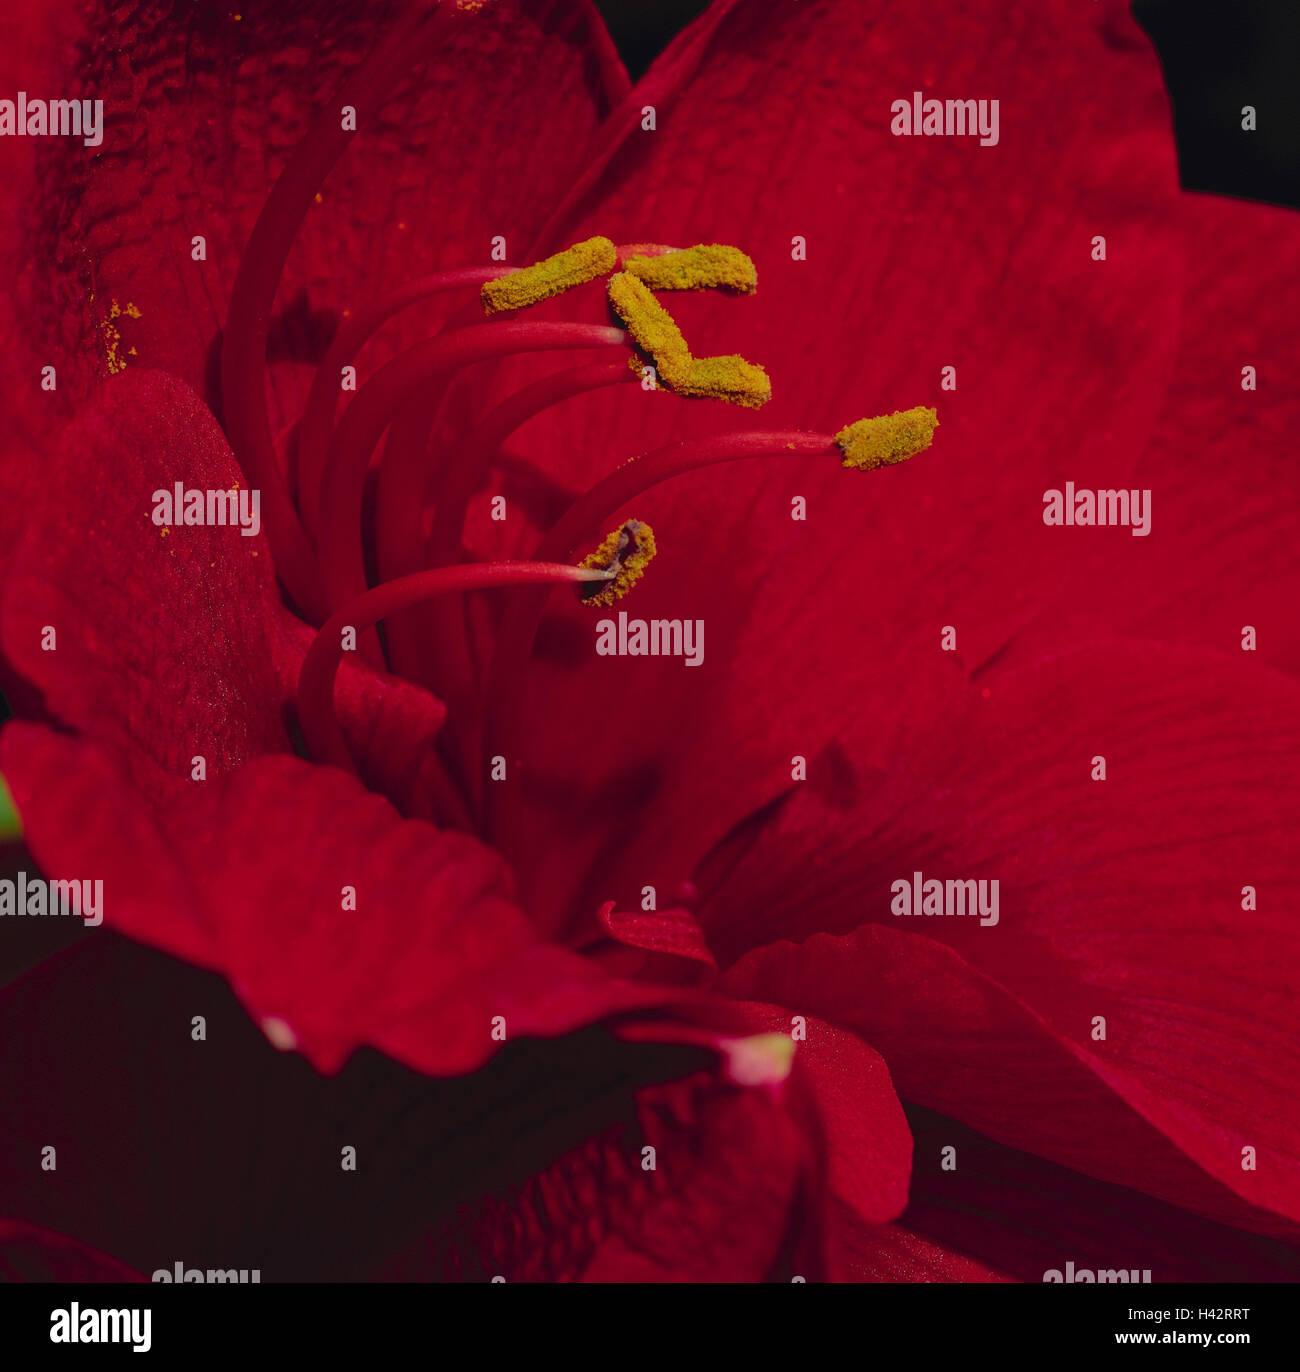 Amaryllis, dust vessels, flower pollen, close up, flower, ornamental flower, ornamental plant, plant, blossom, blossom, Stock Photo